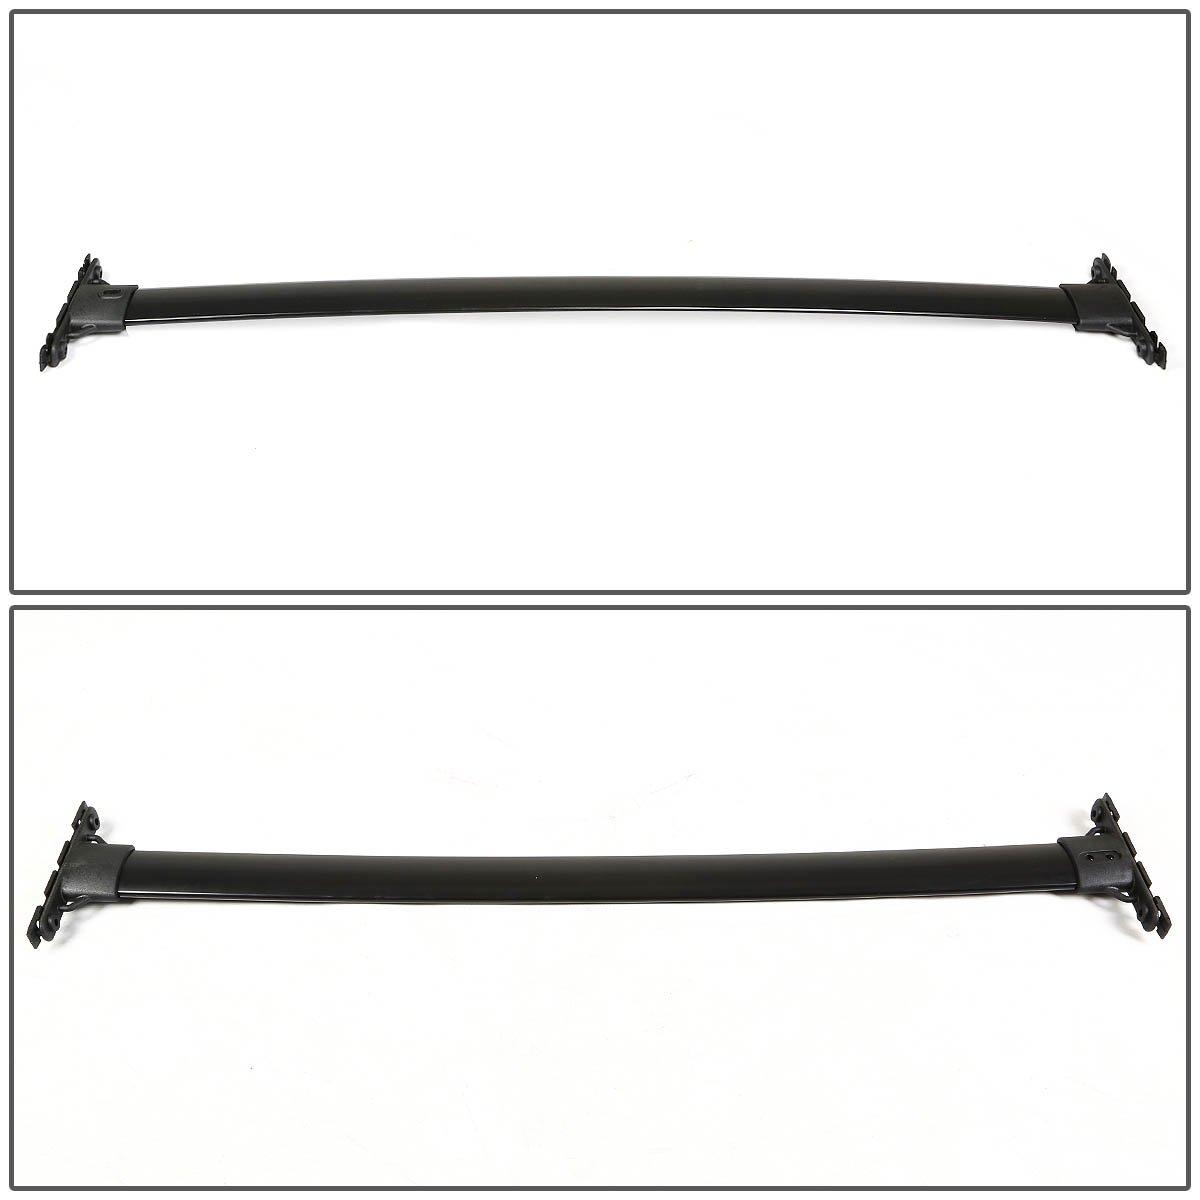 Black Coated For Highlander XU40 Pair of Aluminum OE Style Roof Rack Top Crossbars